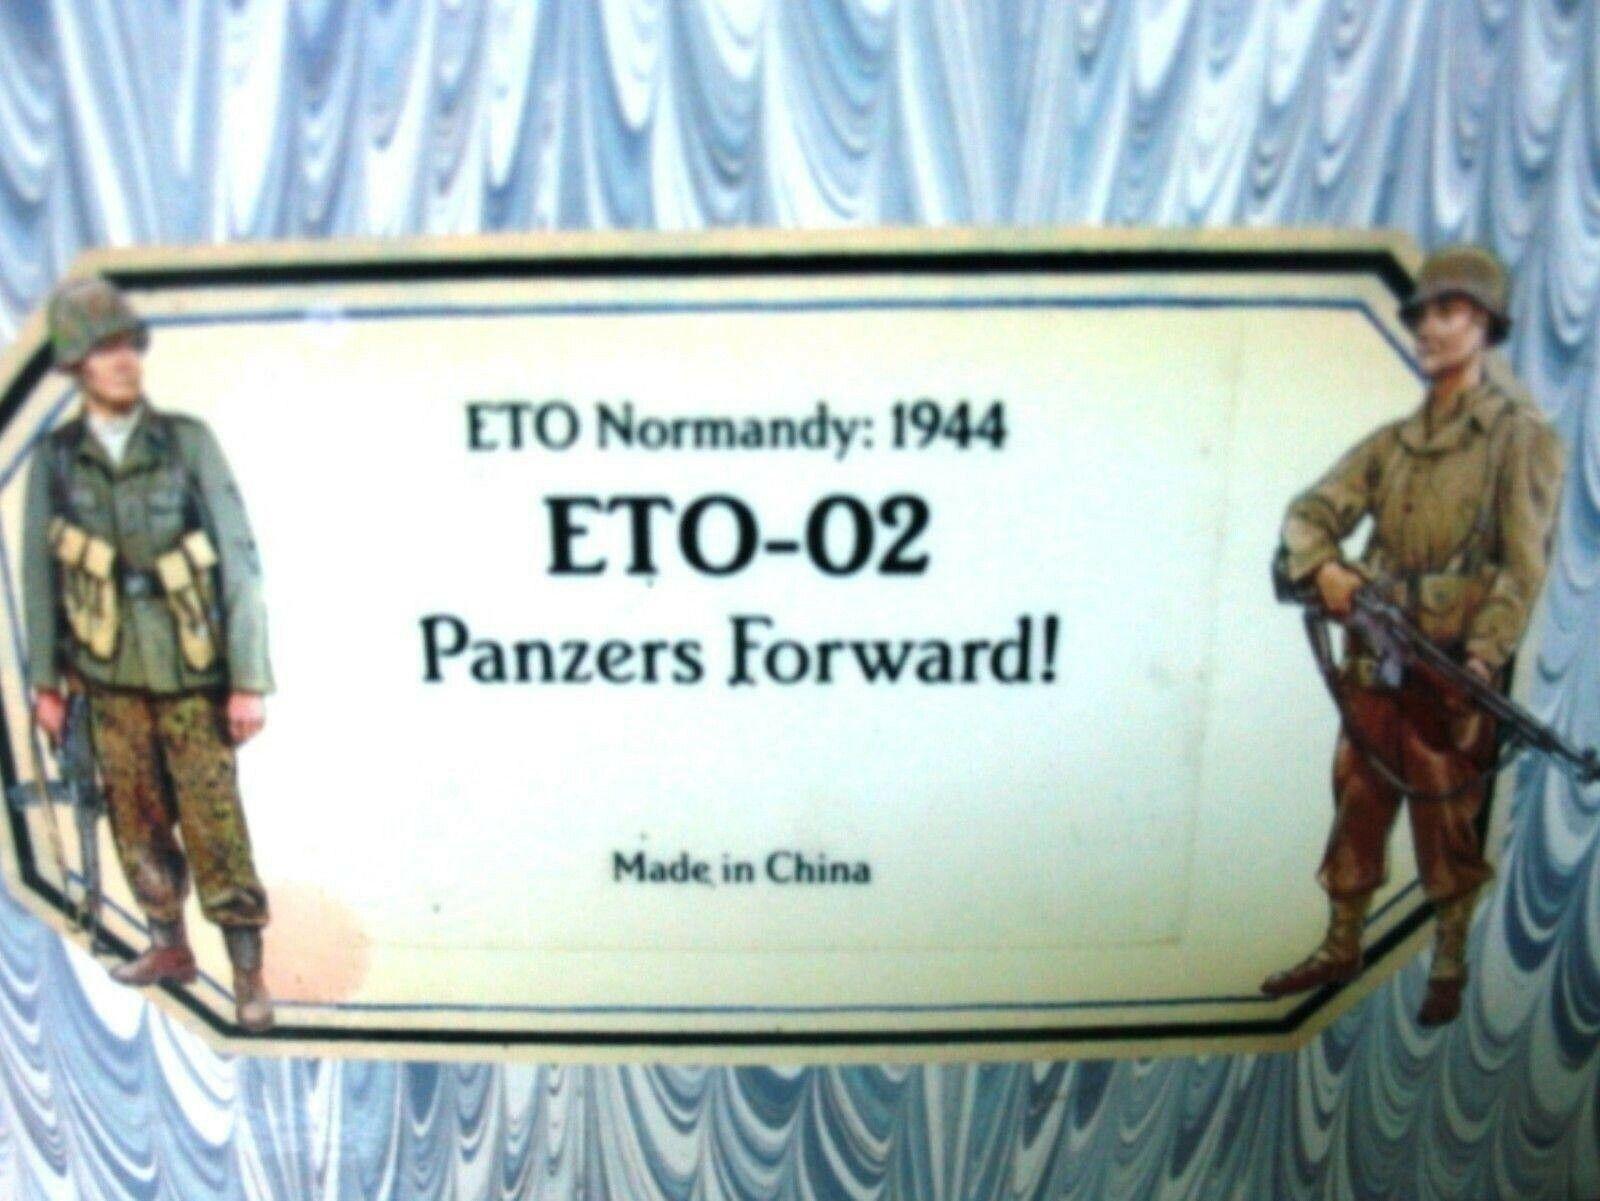 WOW EXTREMELY RARE Old Northwest Trading D Day Eto02 SS 6th Panzer Crewmen BNIB